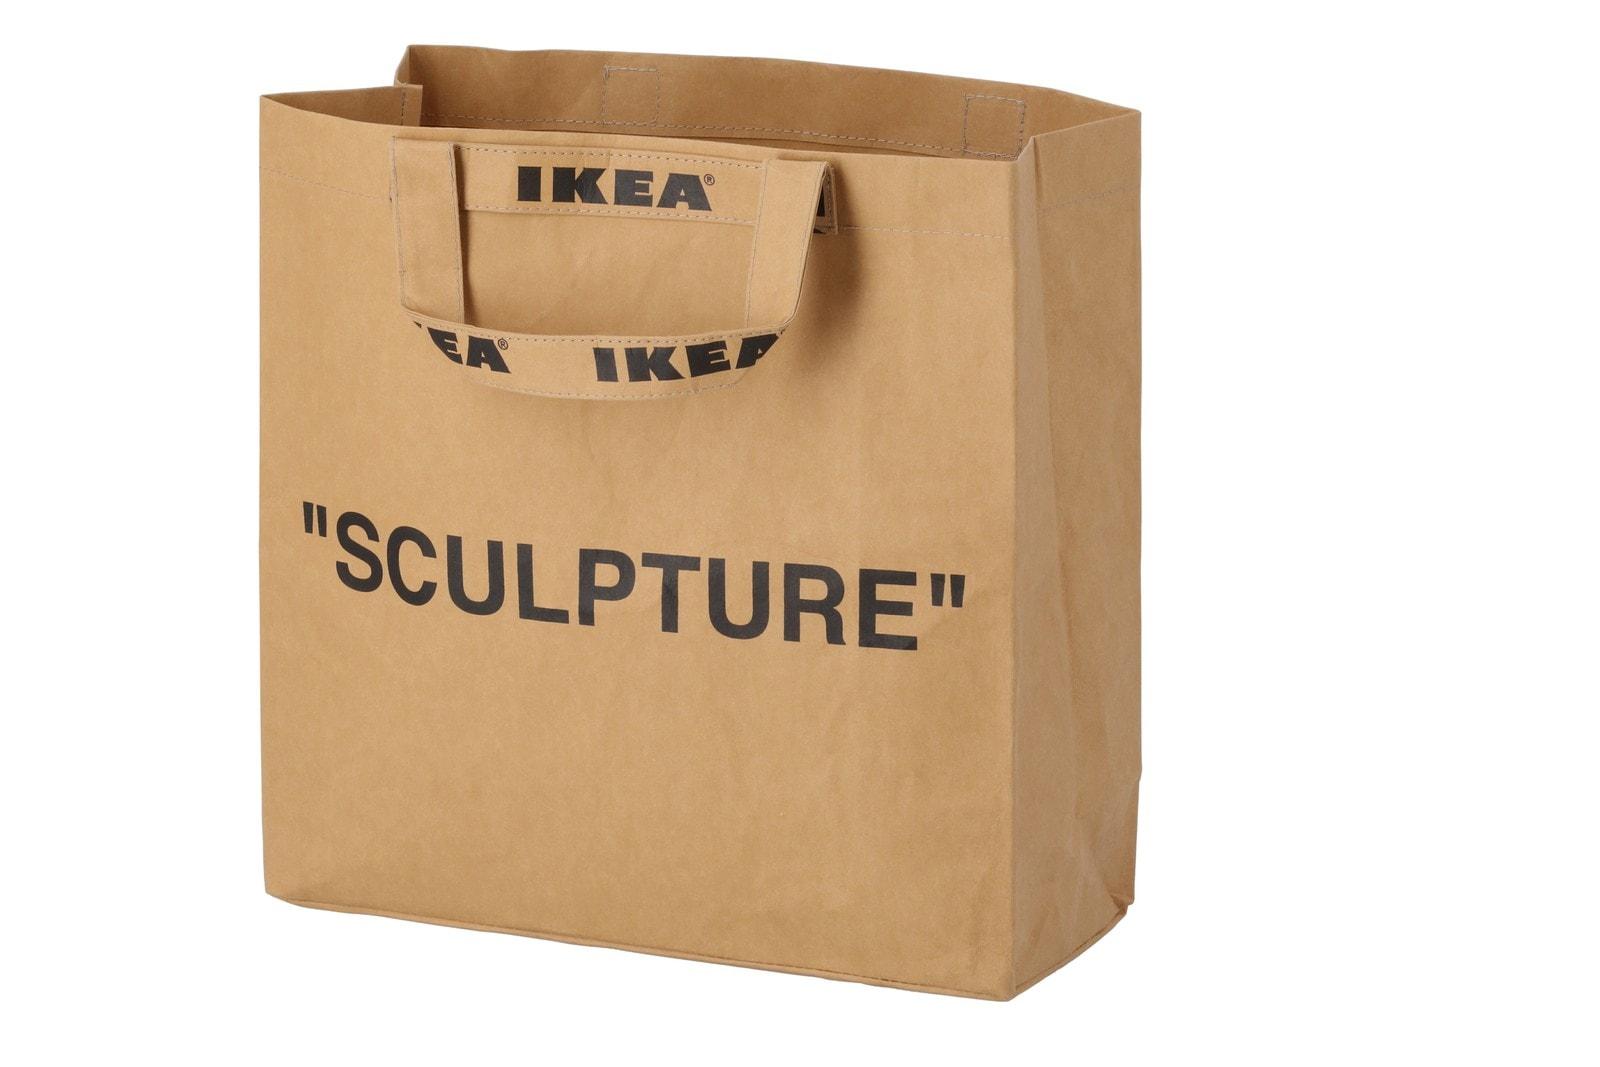 IKEA Virgil Abloh